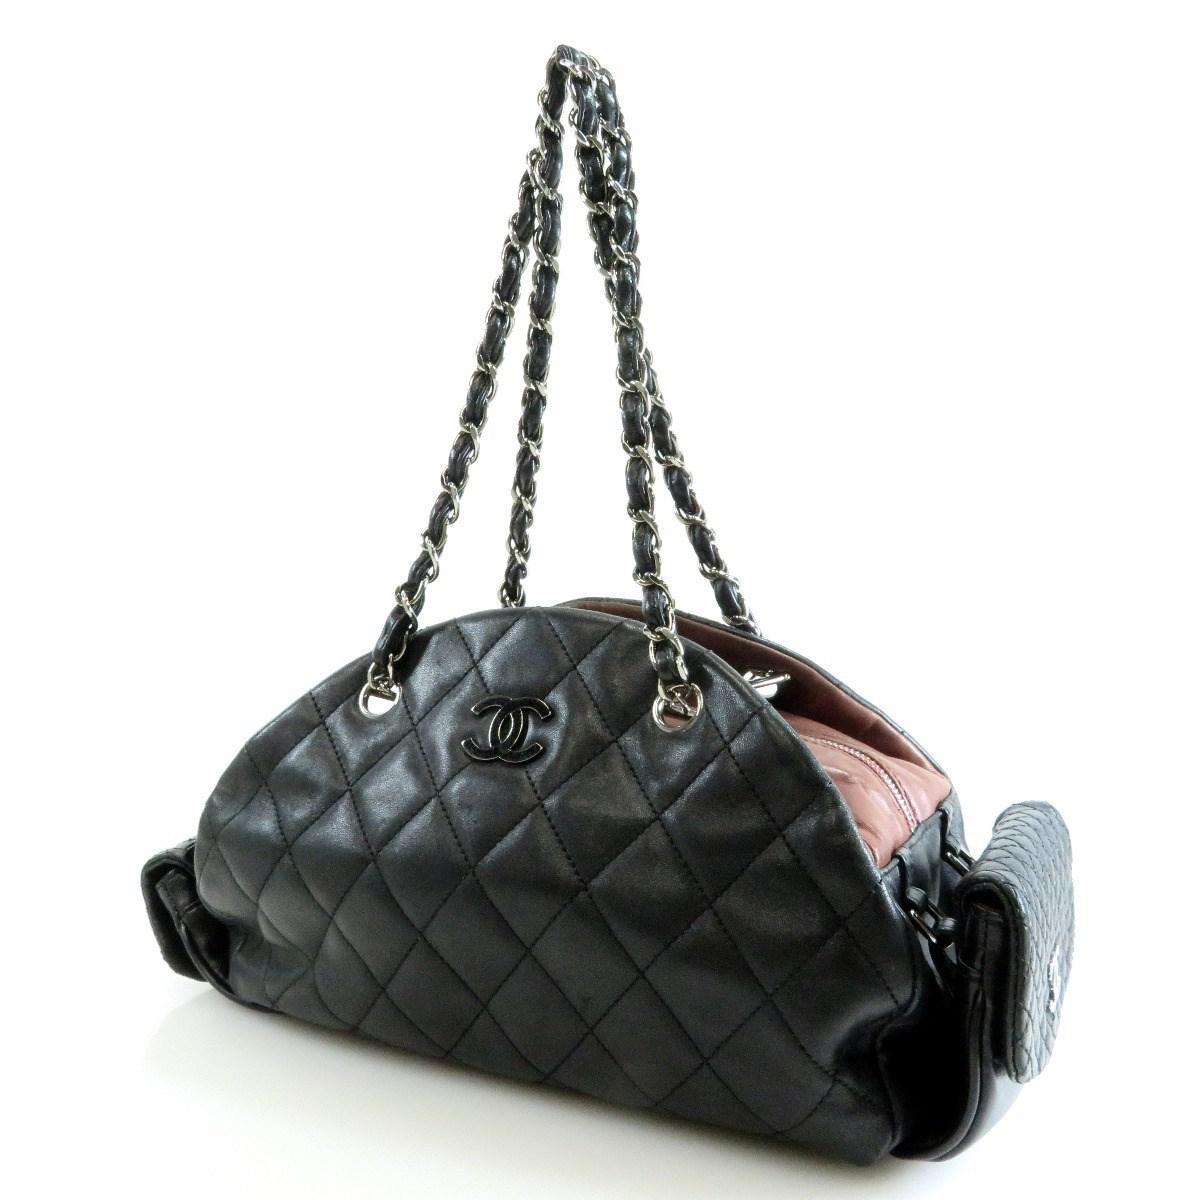 518e425b6dc21c Lyst - Chanel Lambskin Tote Bag Matelasse Coco Mark in Black